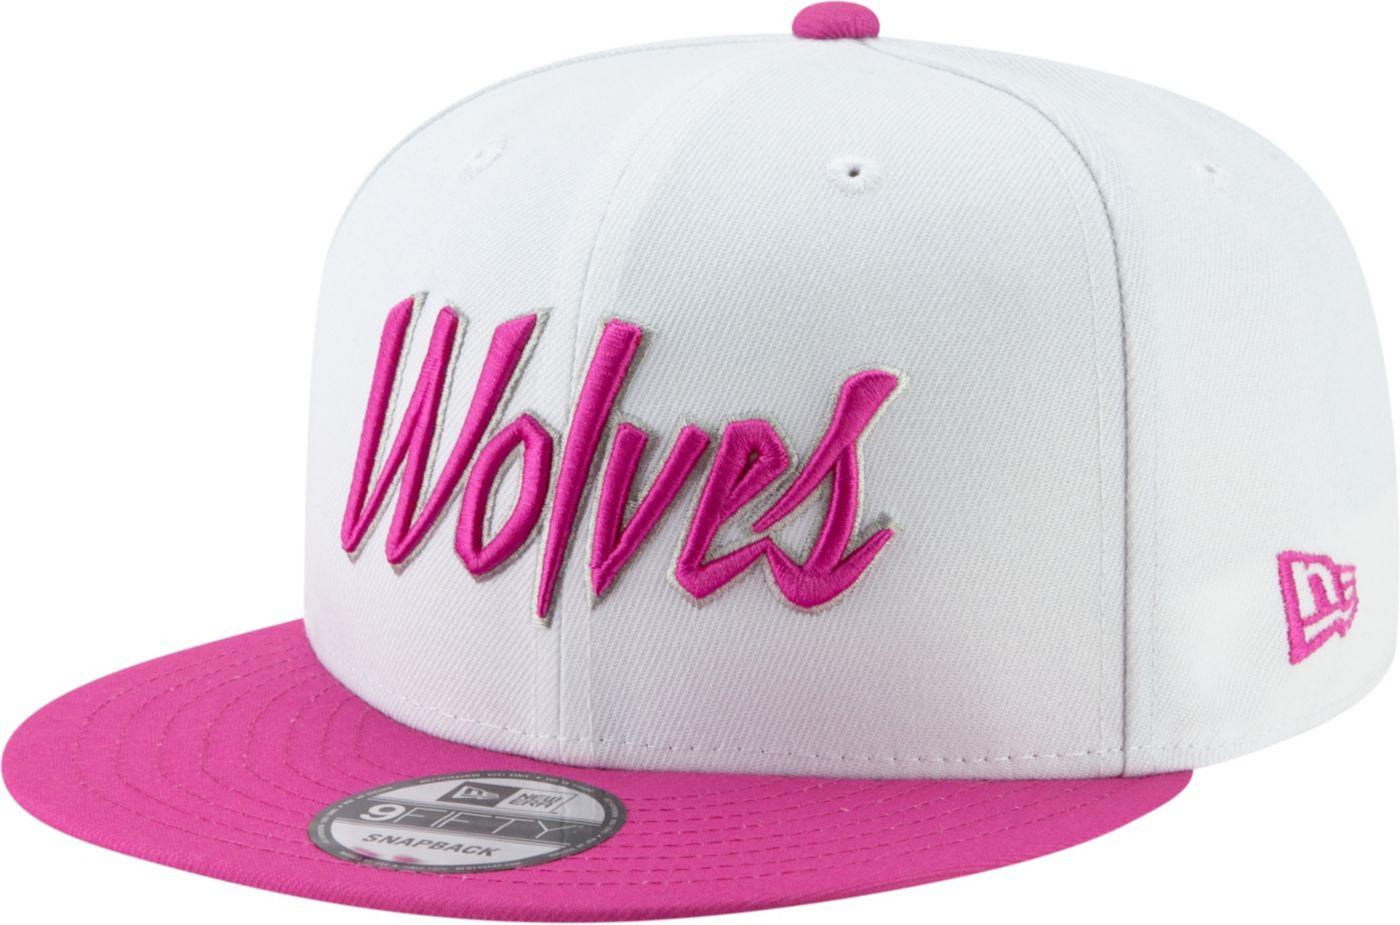 New Era Men's Minnesota Timberwolves 9Fifty Earned Edition Adjustable Snapback Hat